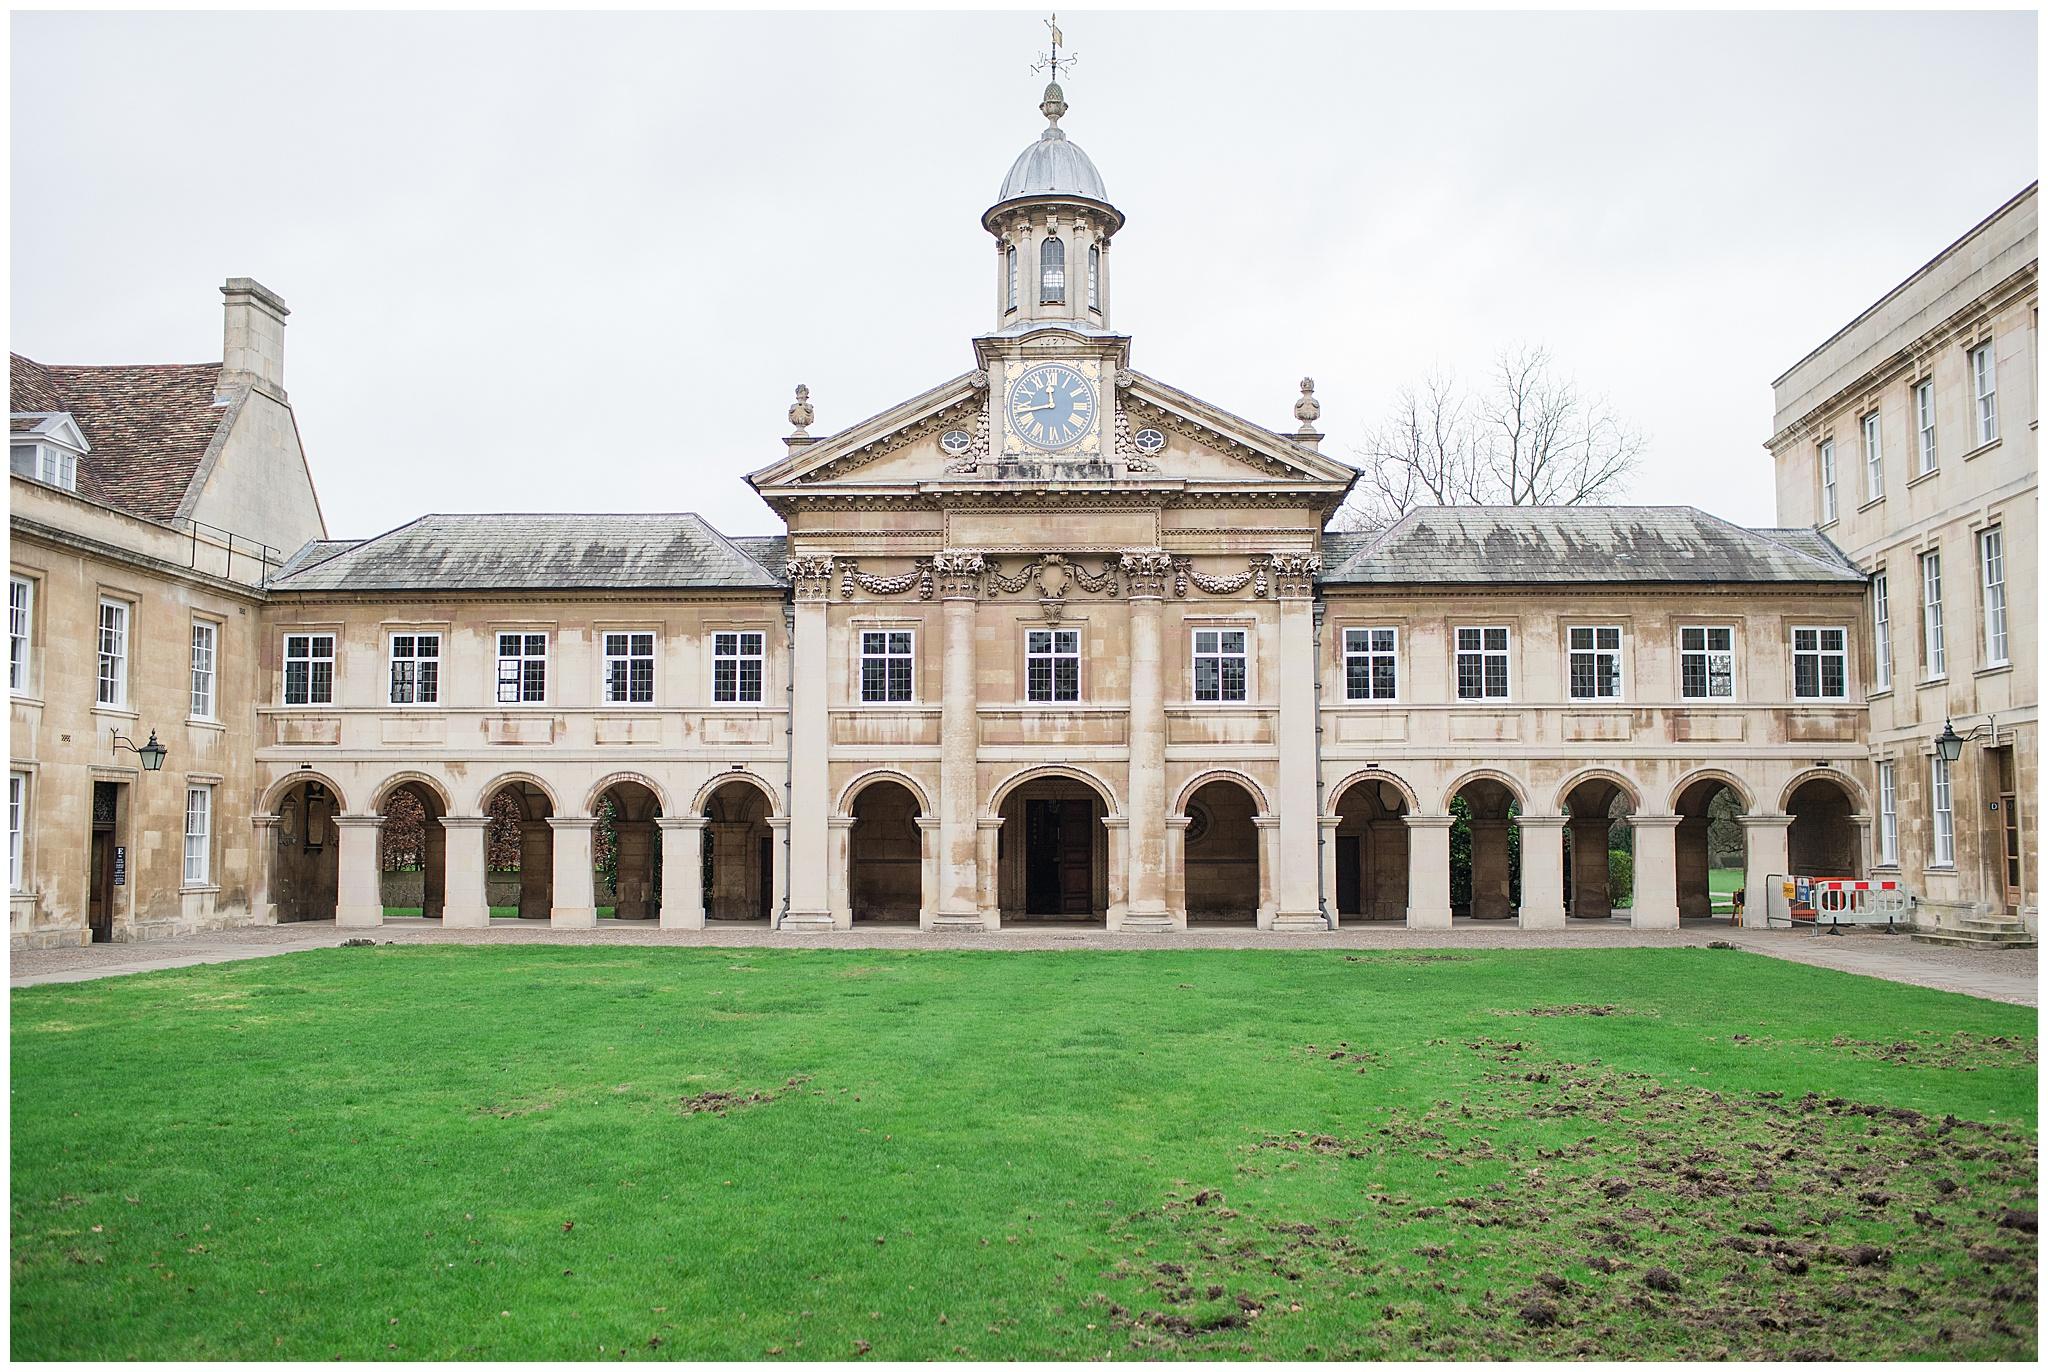 Cambridge_day1_0002.jpg